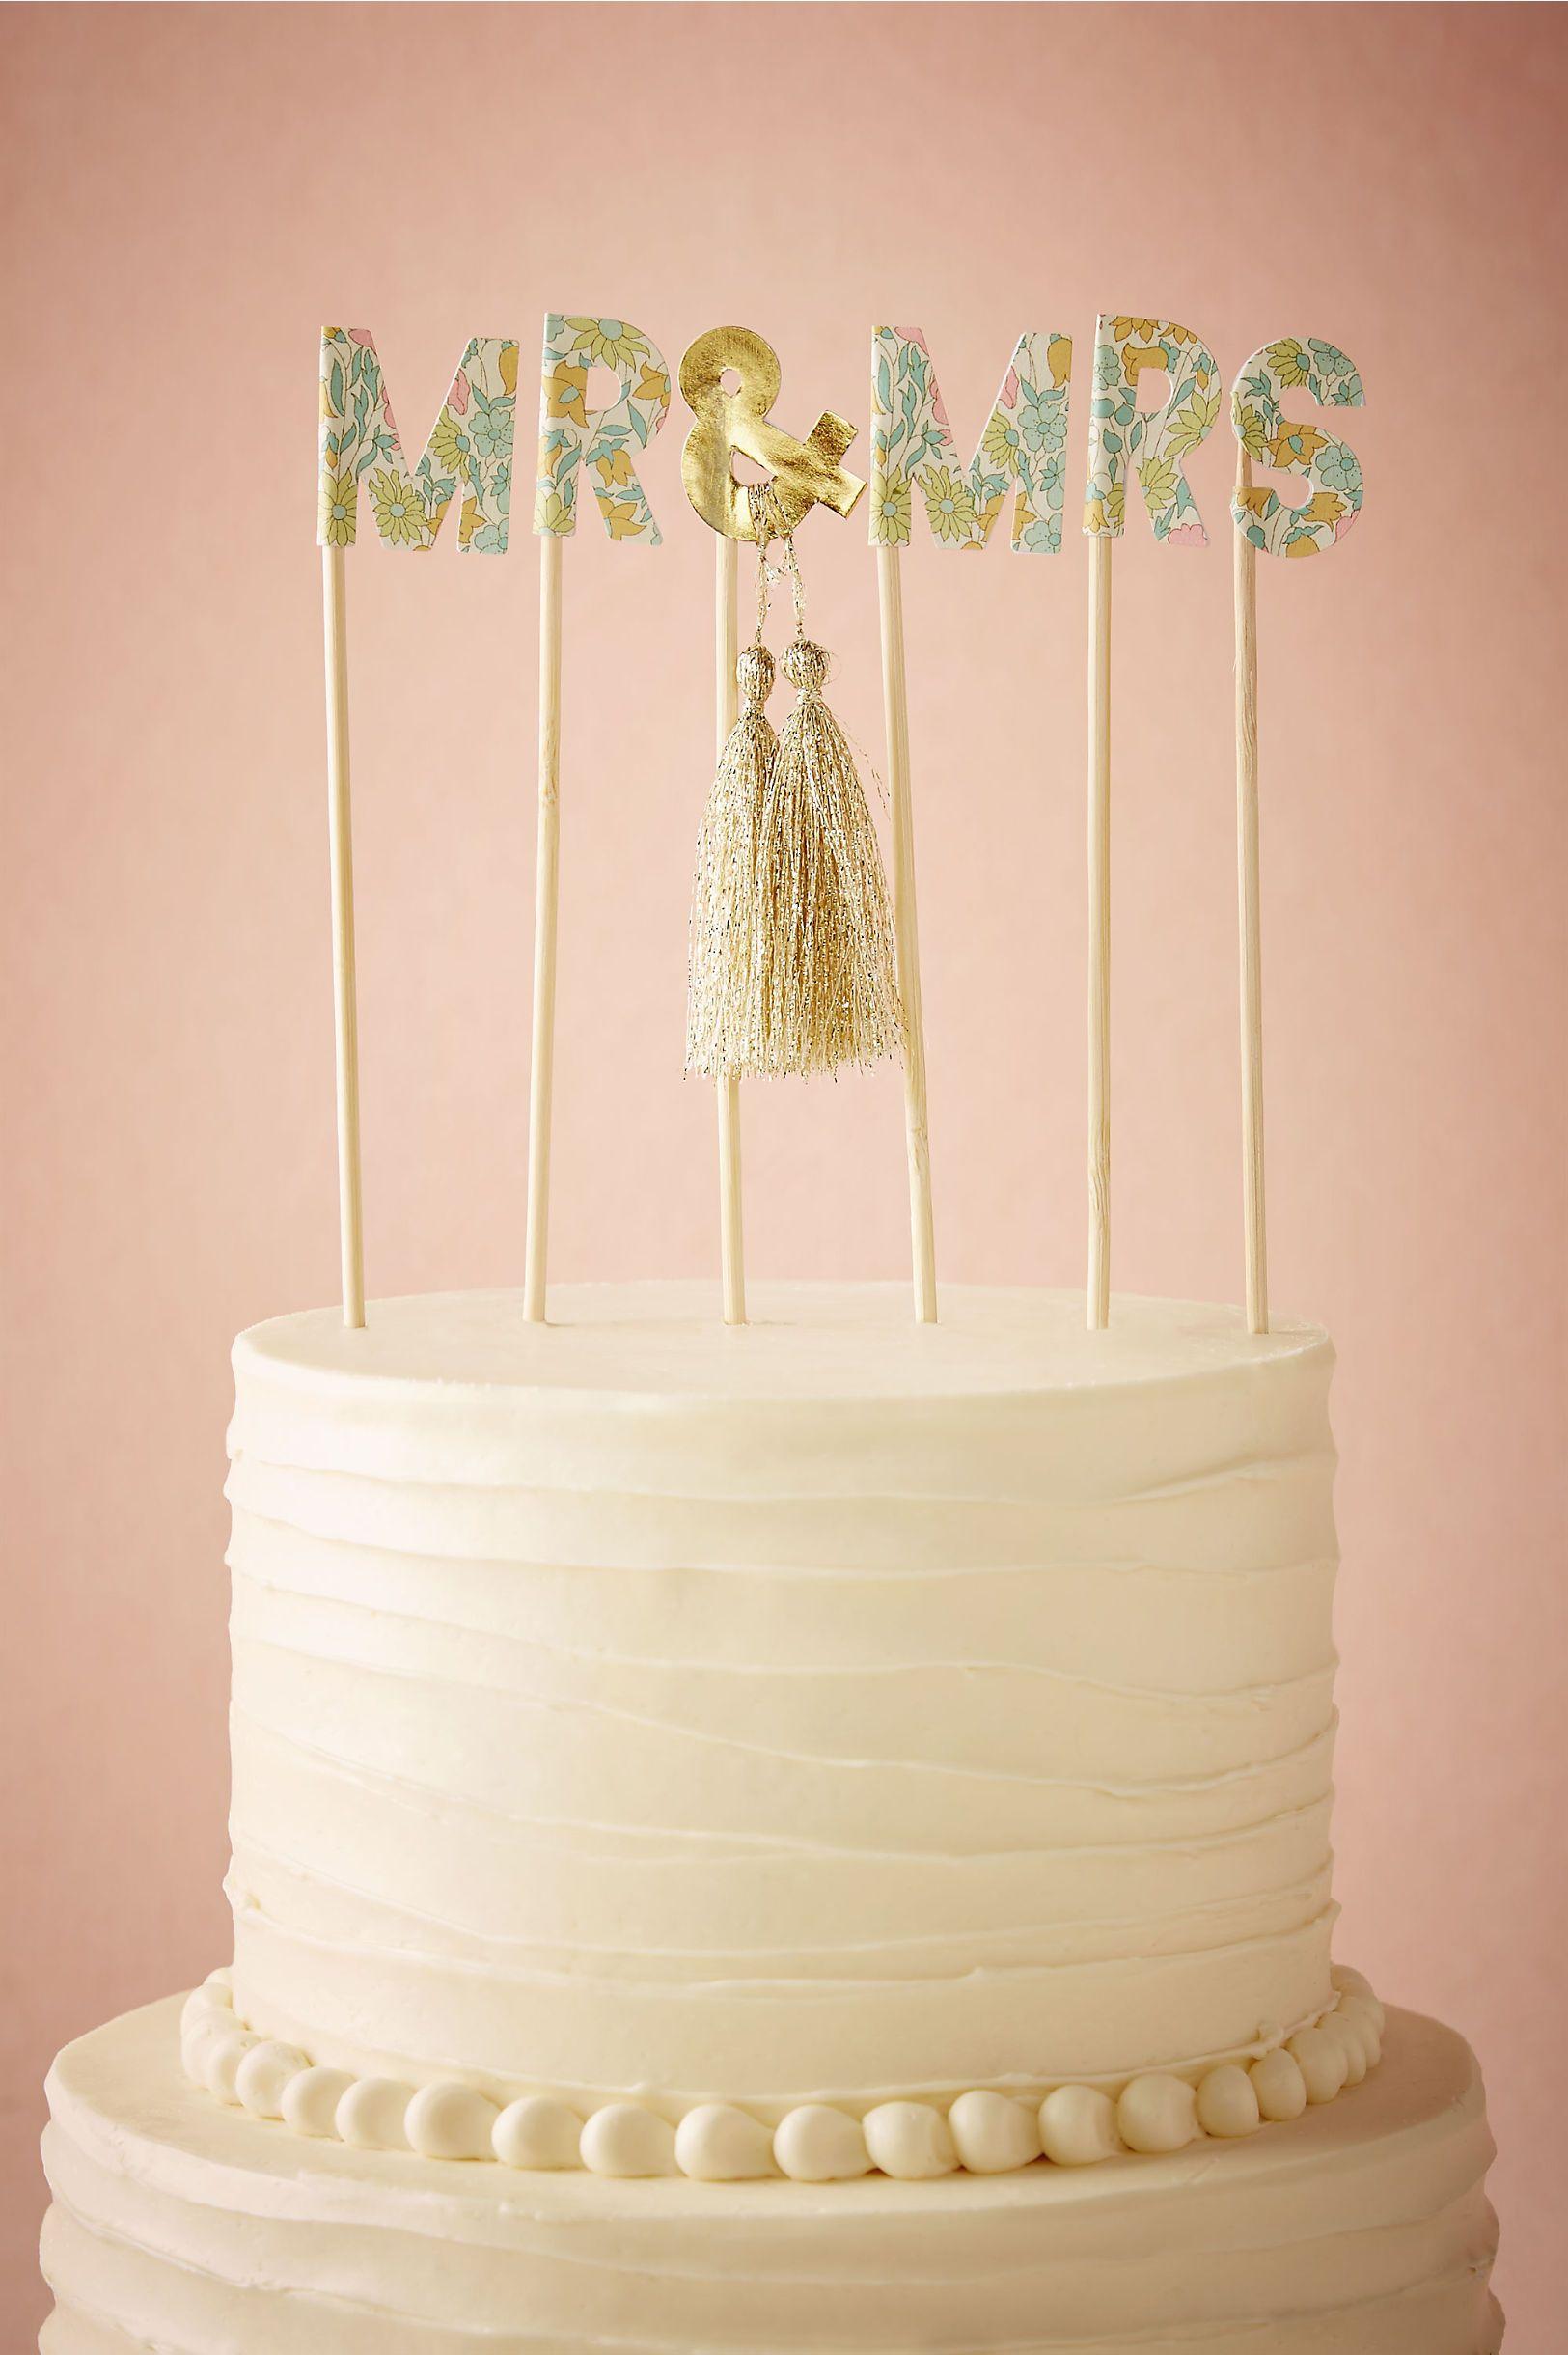 Bhldn liberty print cake topper in dcor cake accessories at bhldn bhldn liberty print cake topper in dcor cake accessories at bhldn junglespirit Gallery